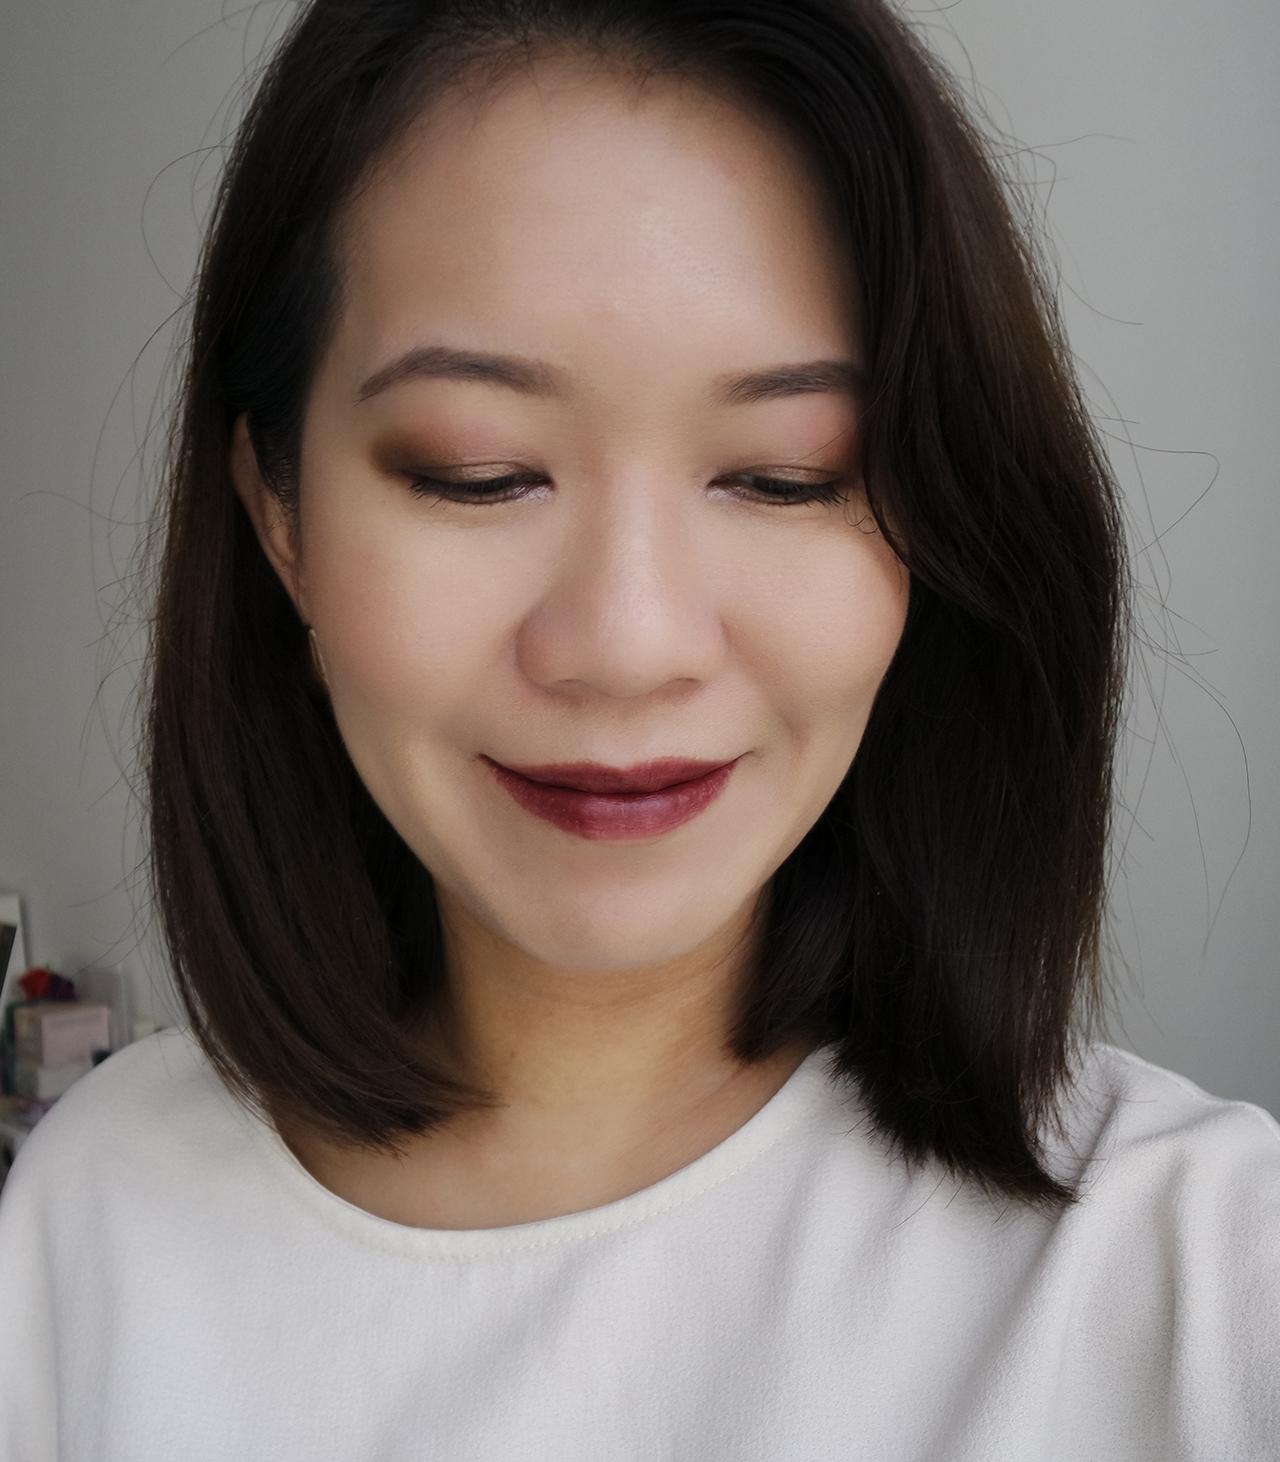 Shu Uemura La Maison du Chocolat makeup look